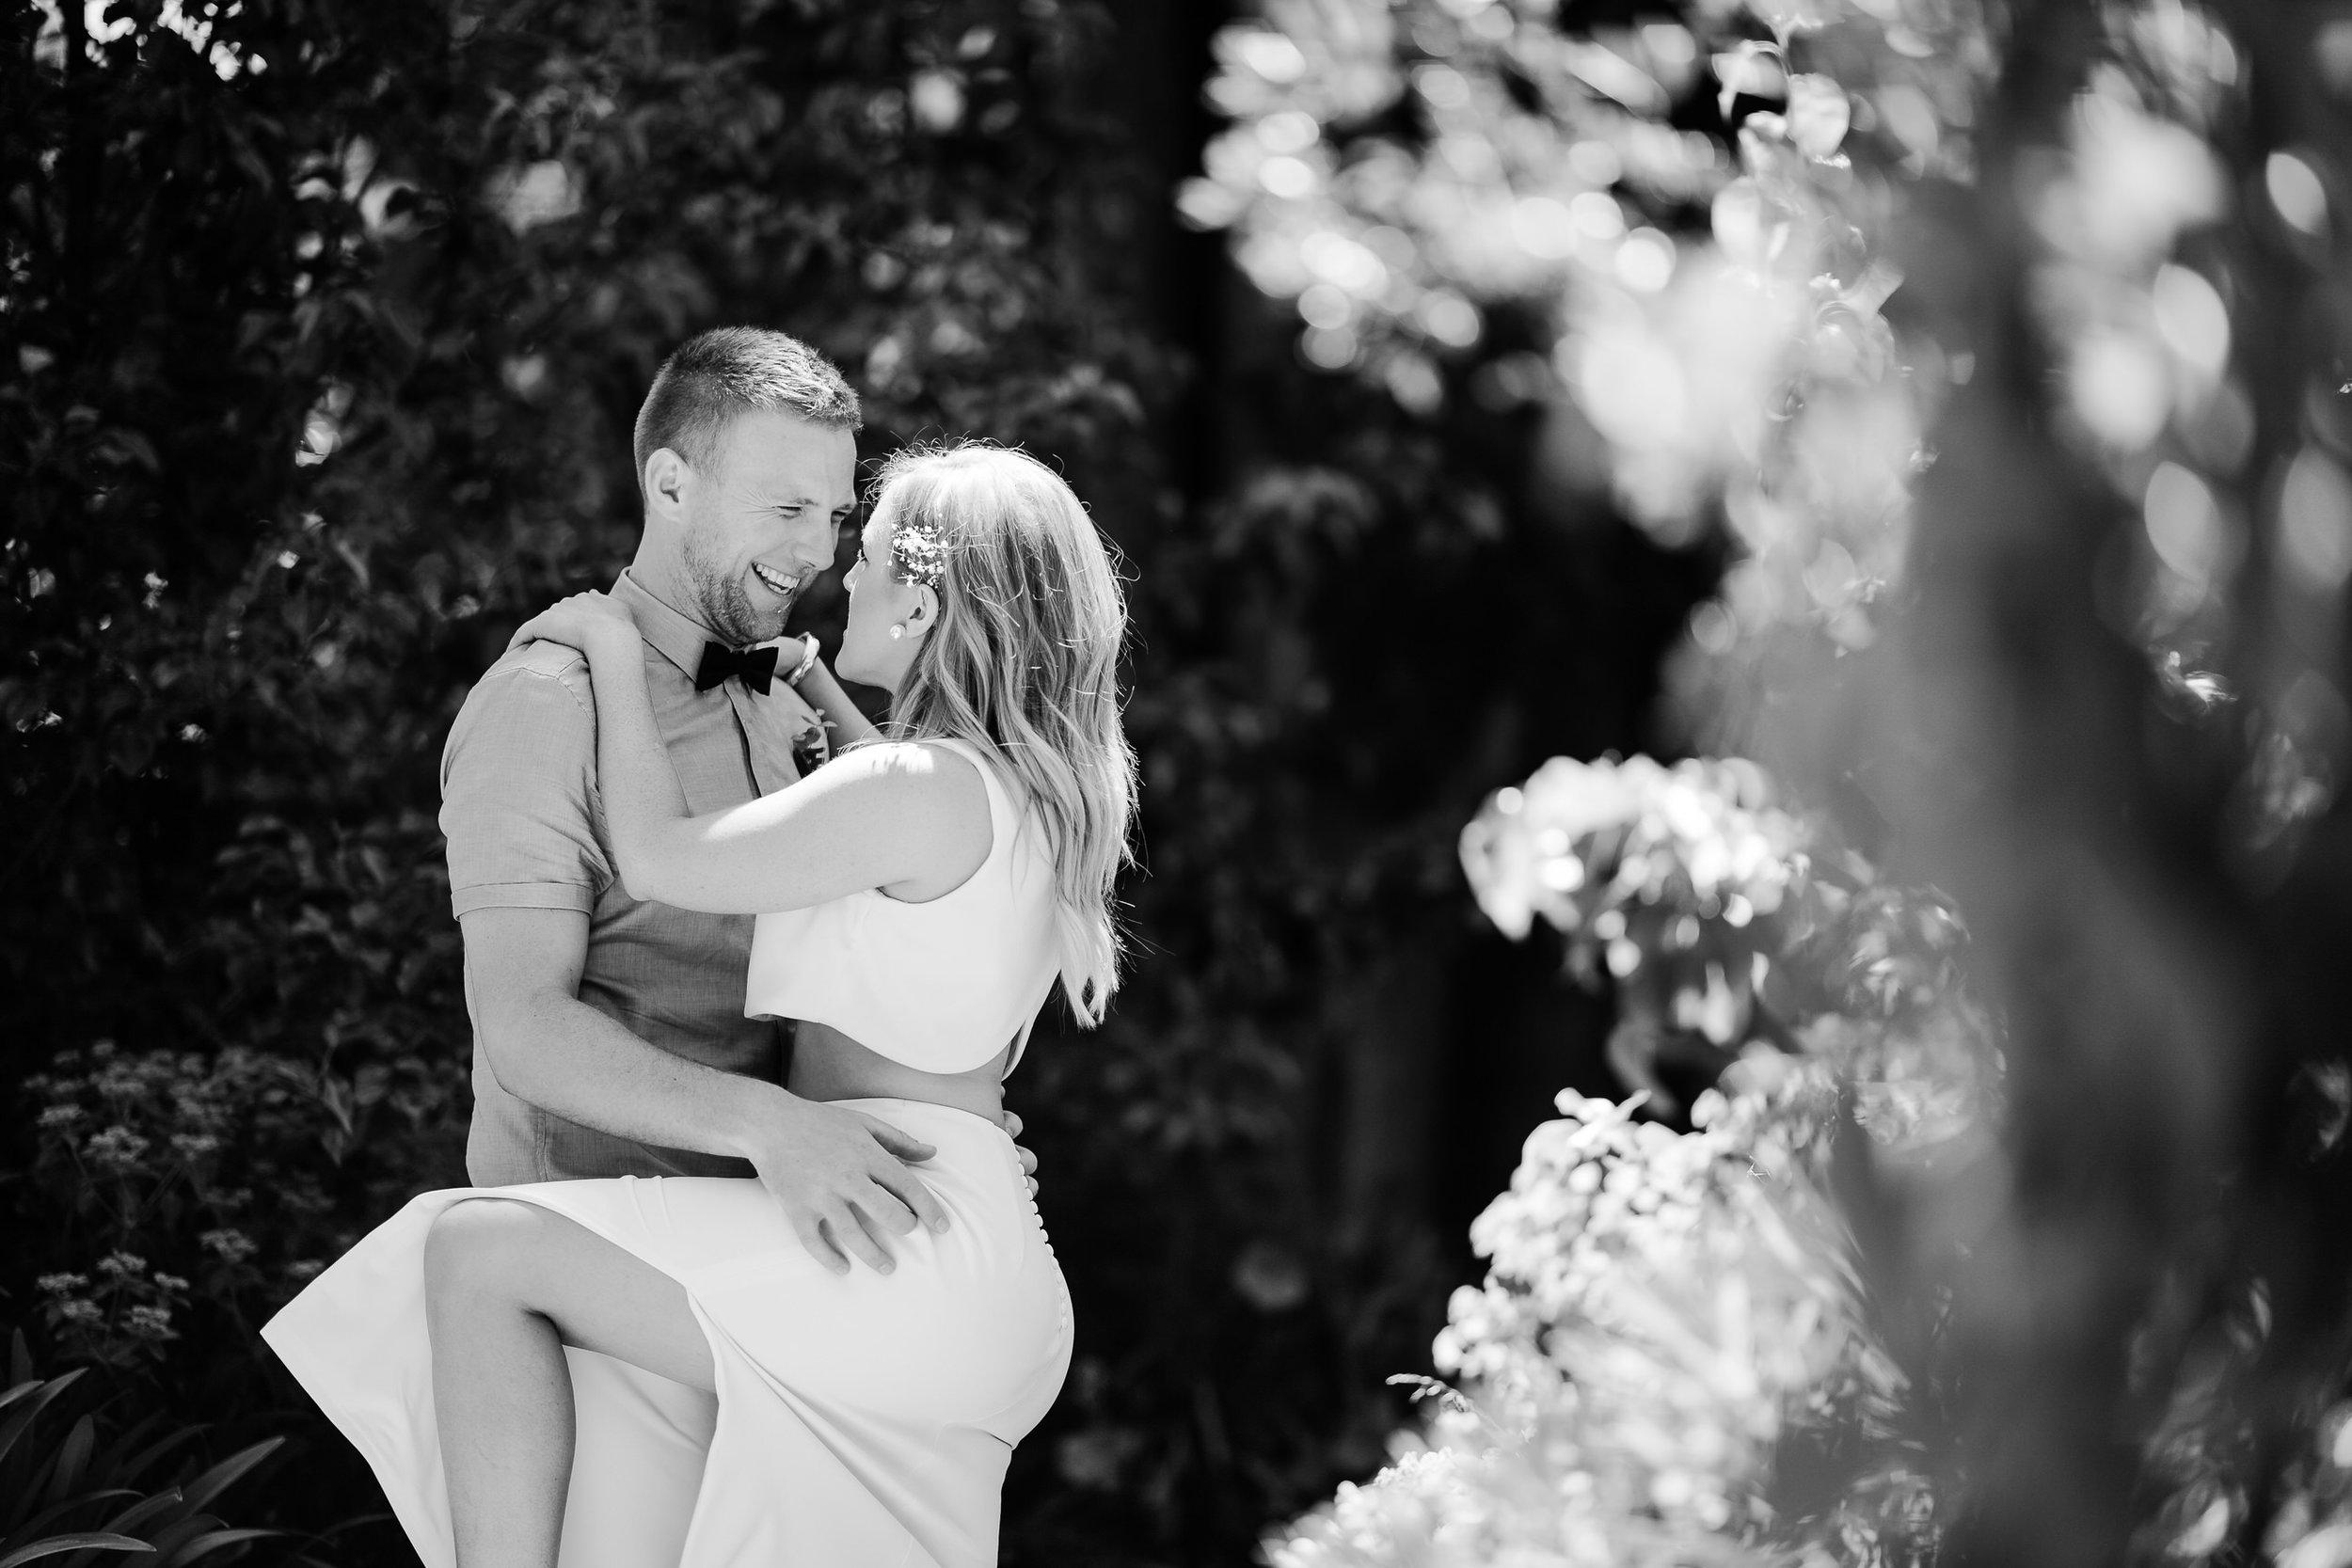 Bendigo_Wedding_Photography_Justin_Jim_BelvoirPark-63.JPG